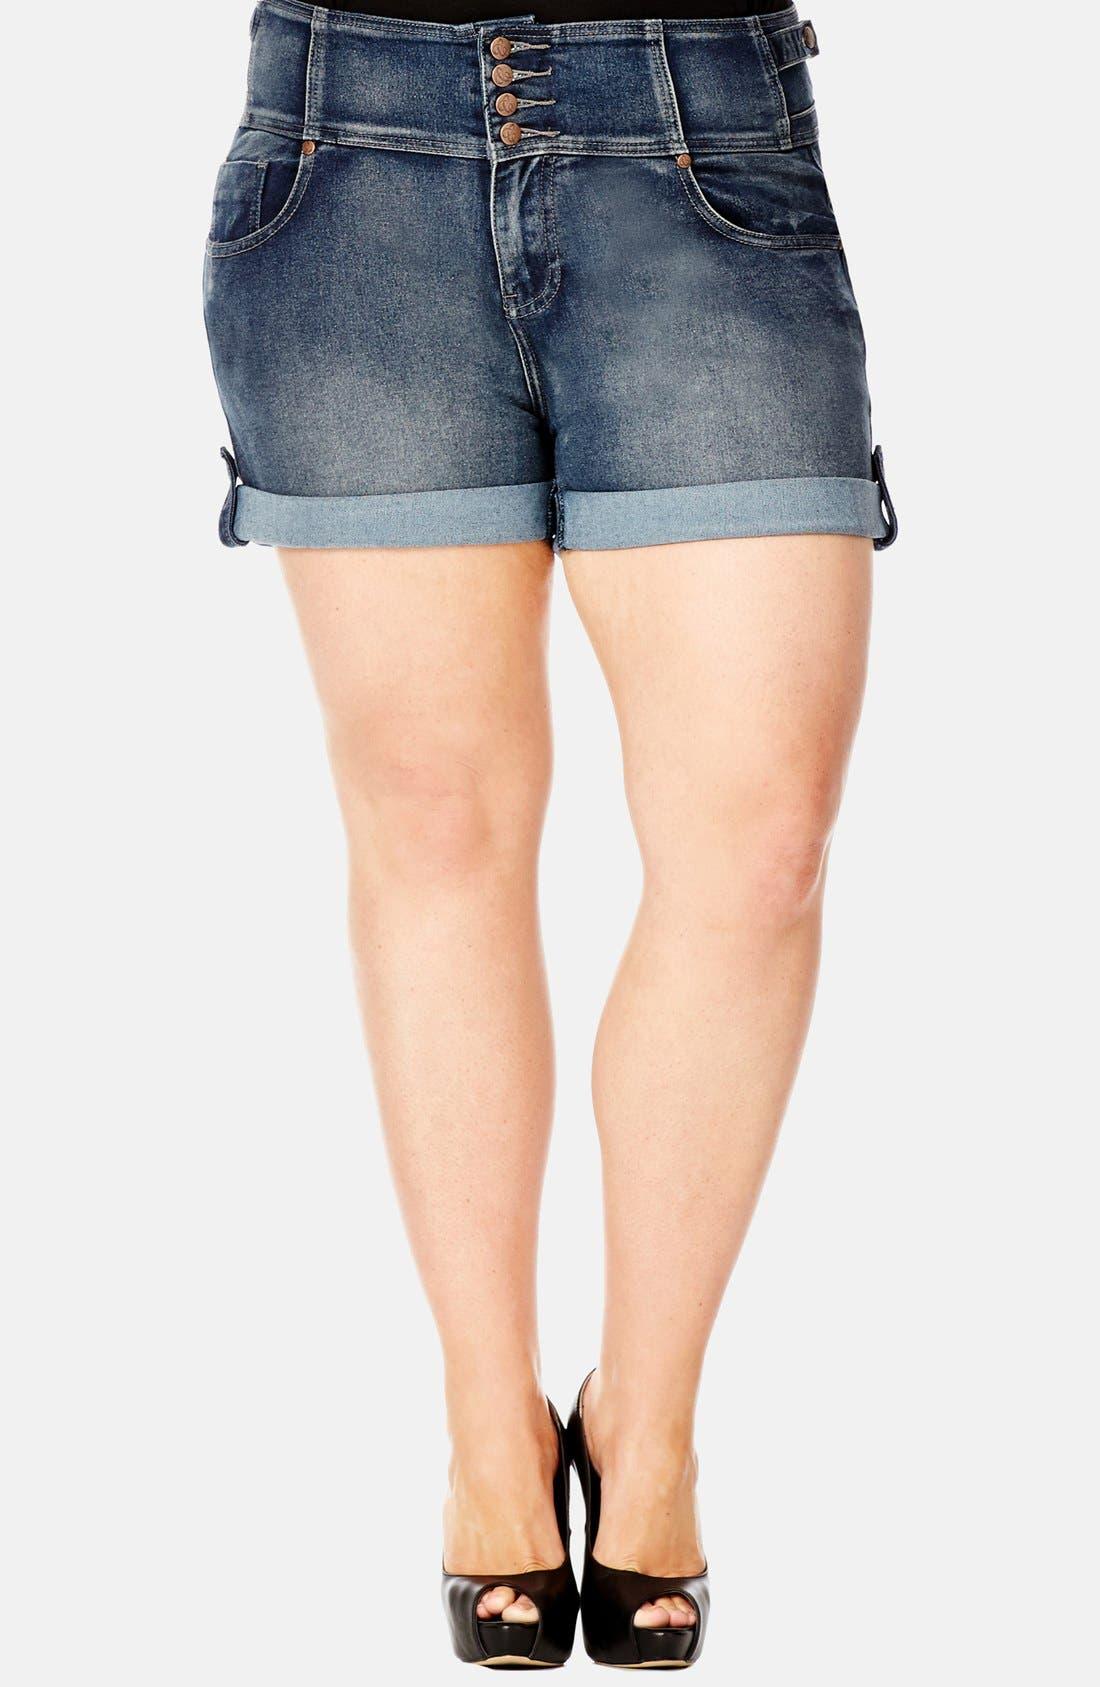 Main Image - City Chic High Waist Stretch Denim Shorts (Dark) (Plus Size)